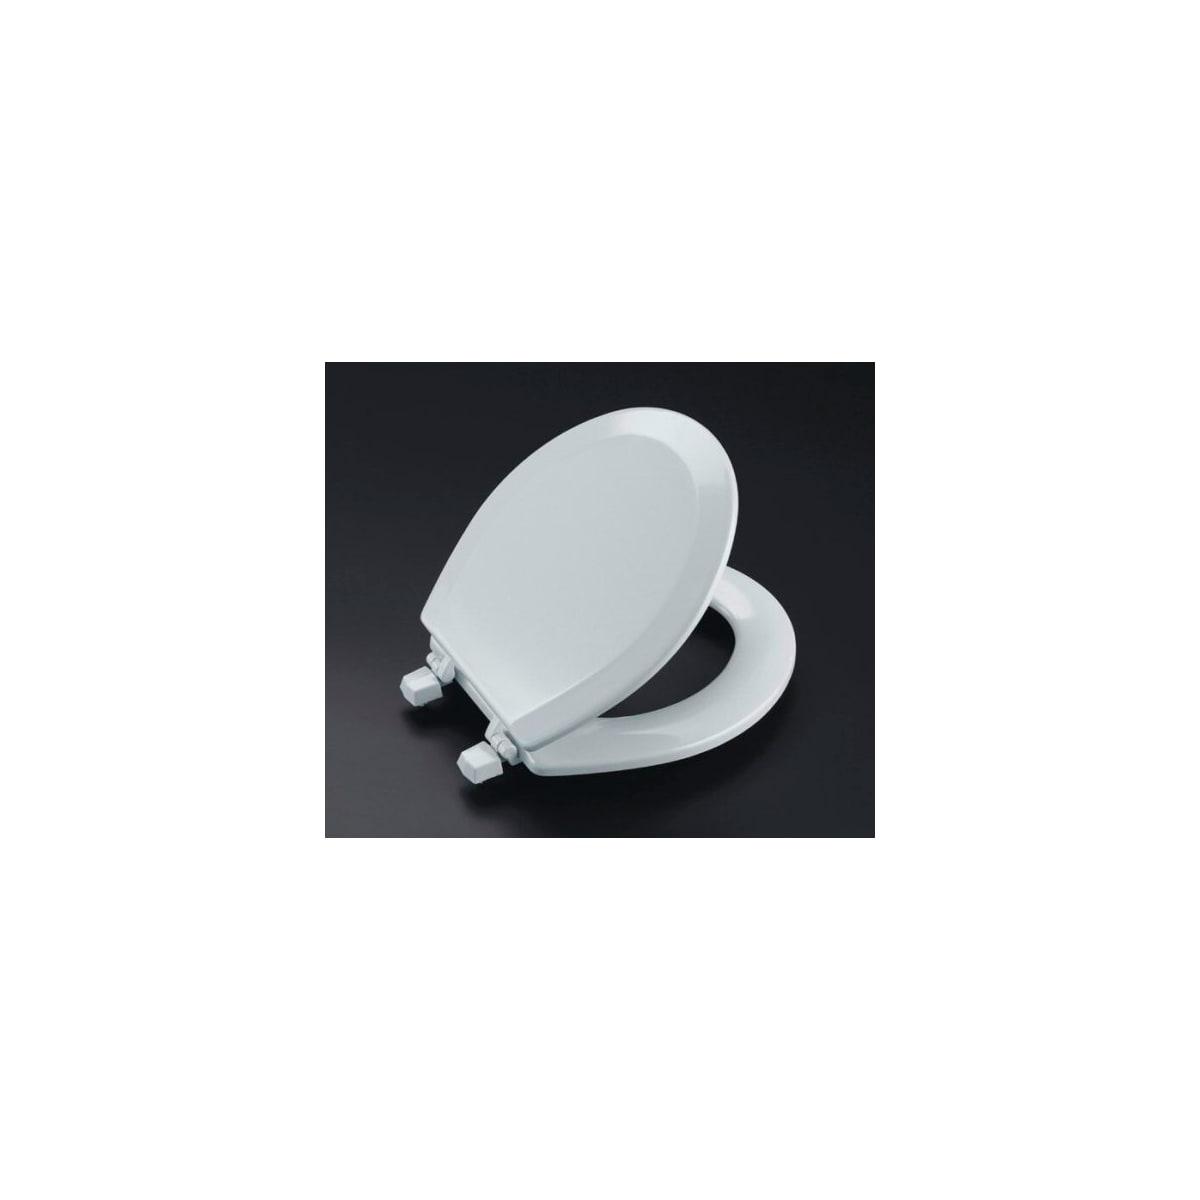 Pleasing Kohler K 4716 T 47 Almond Triko Round Closed Front Toilet Machost Co Dining Chair Design Ideas Machostcouk